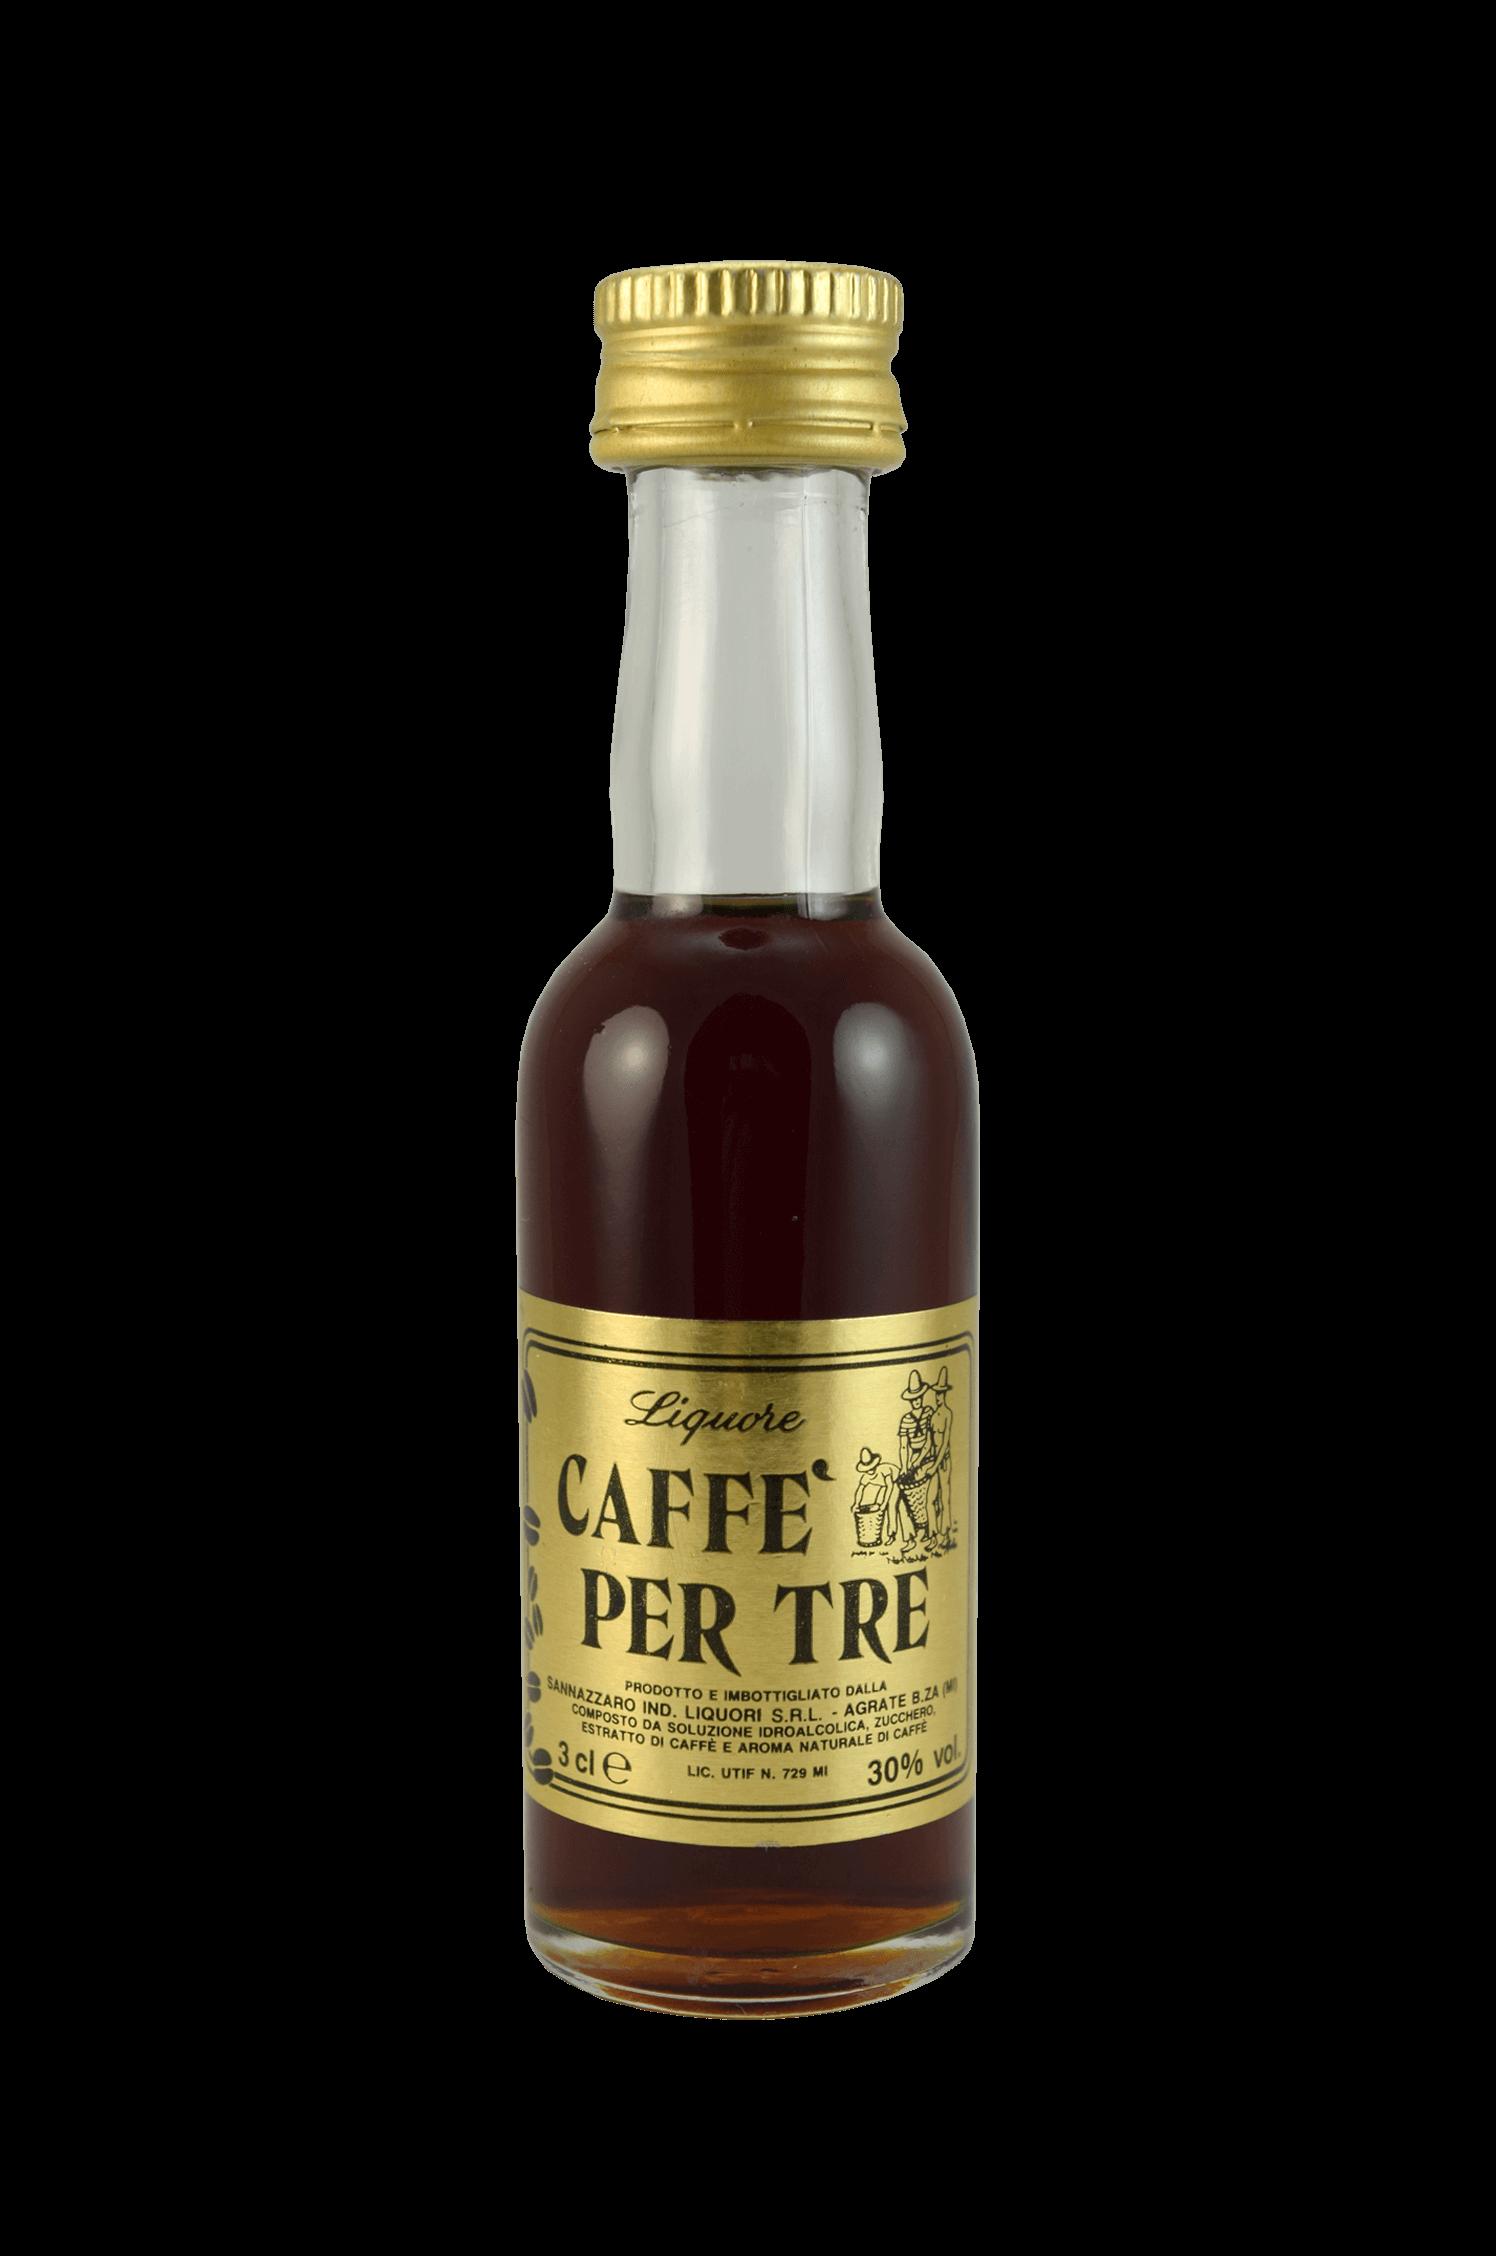 Liquore Caffe Per Tre